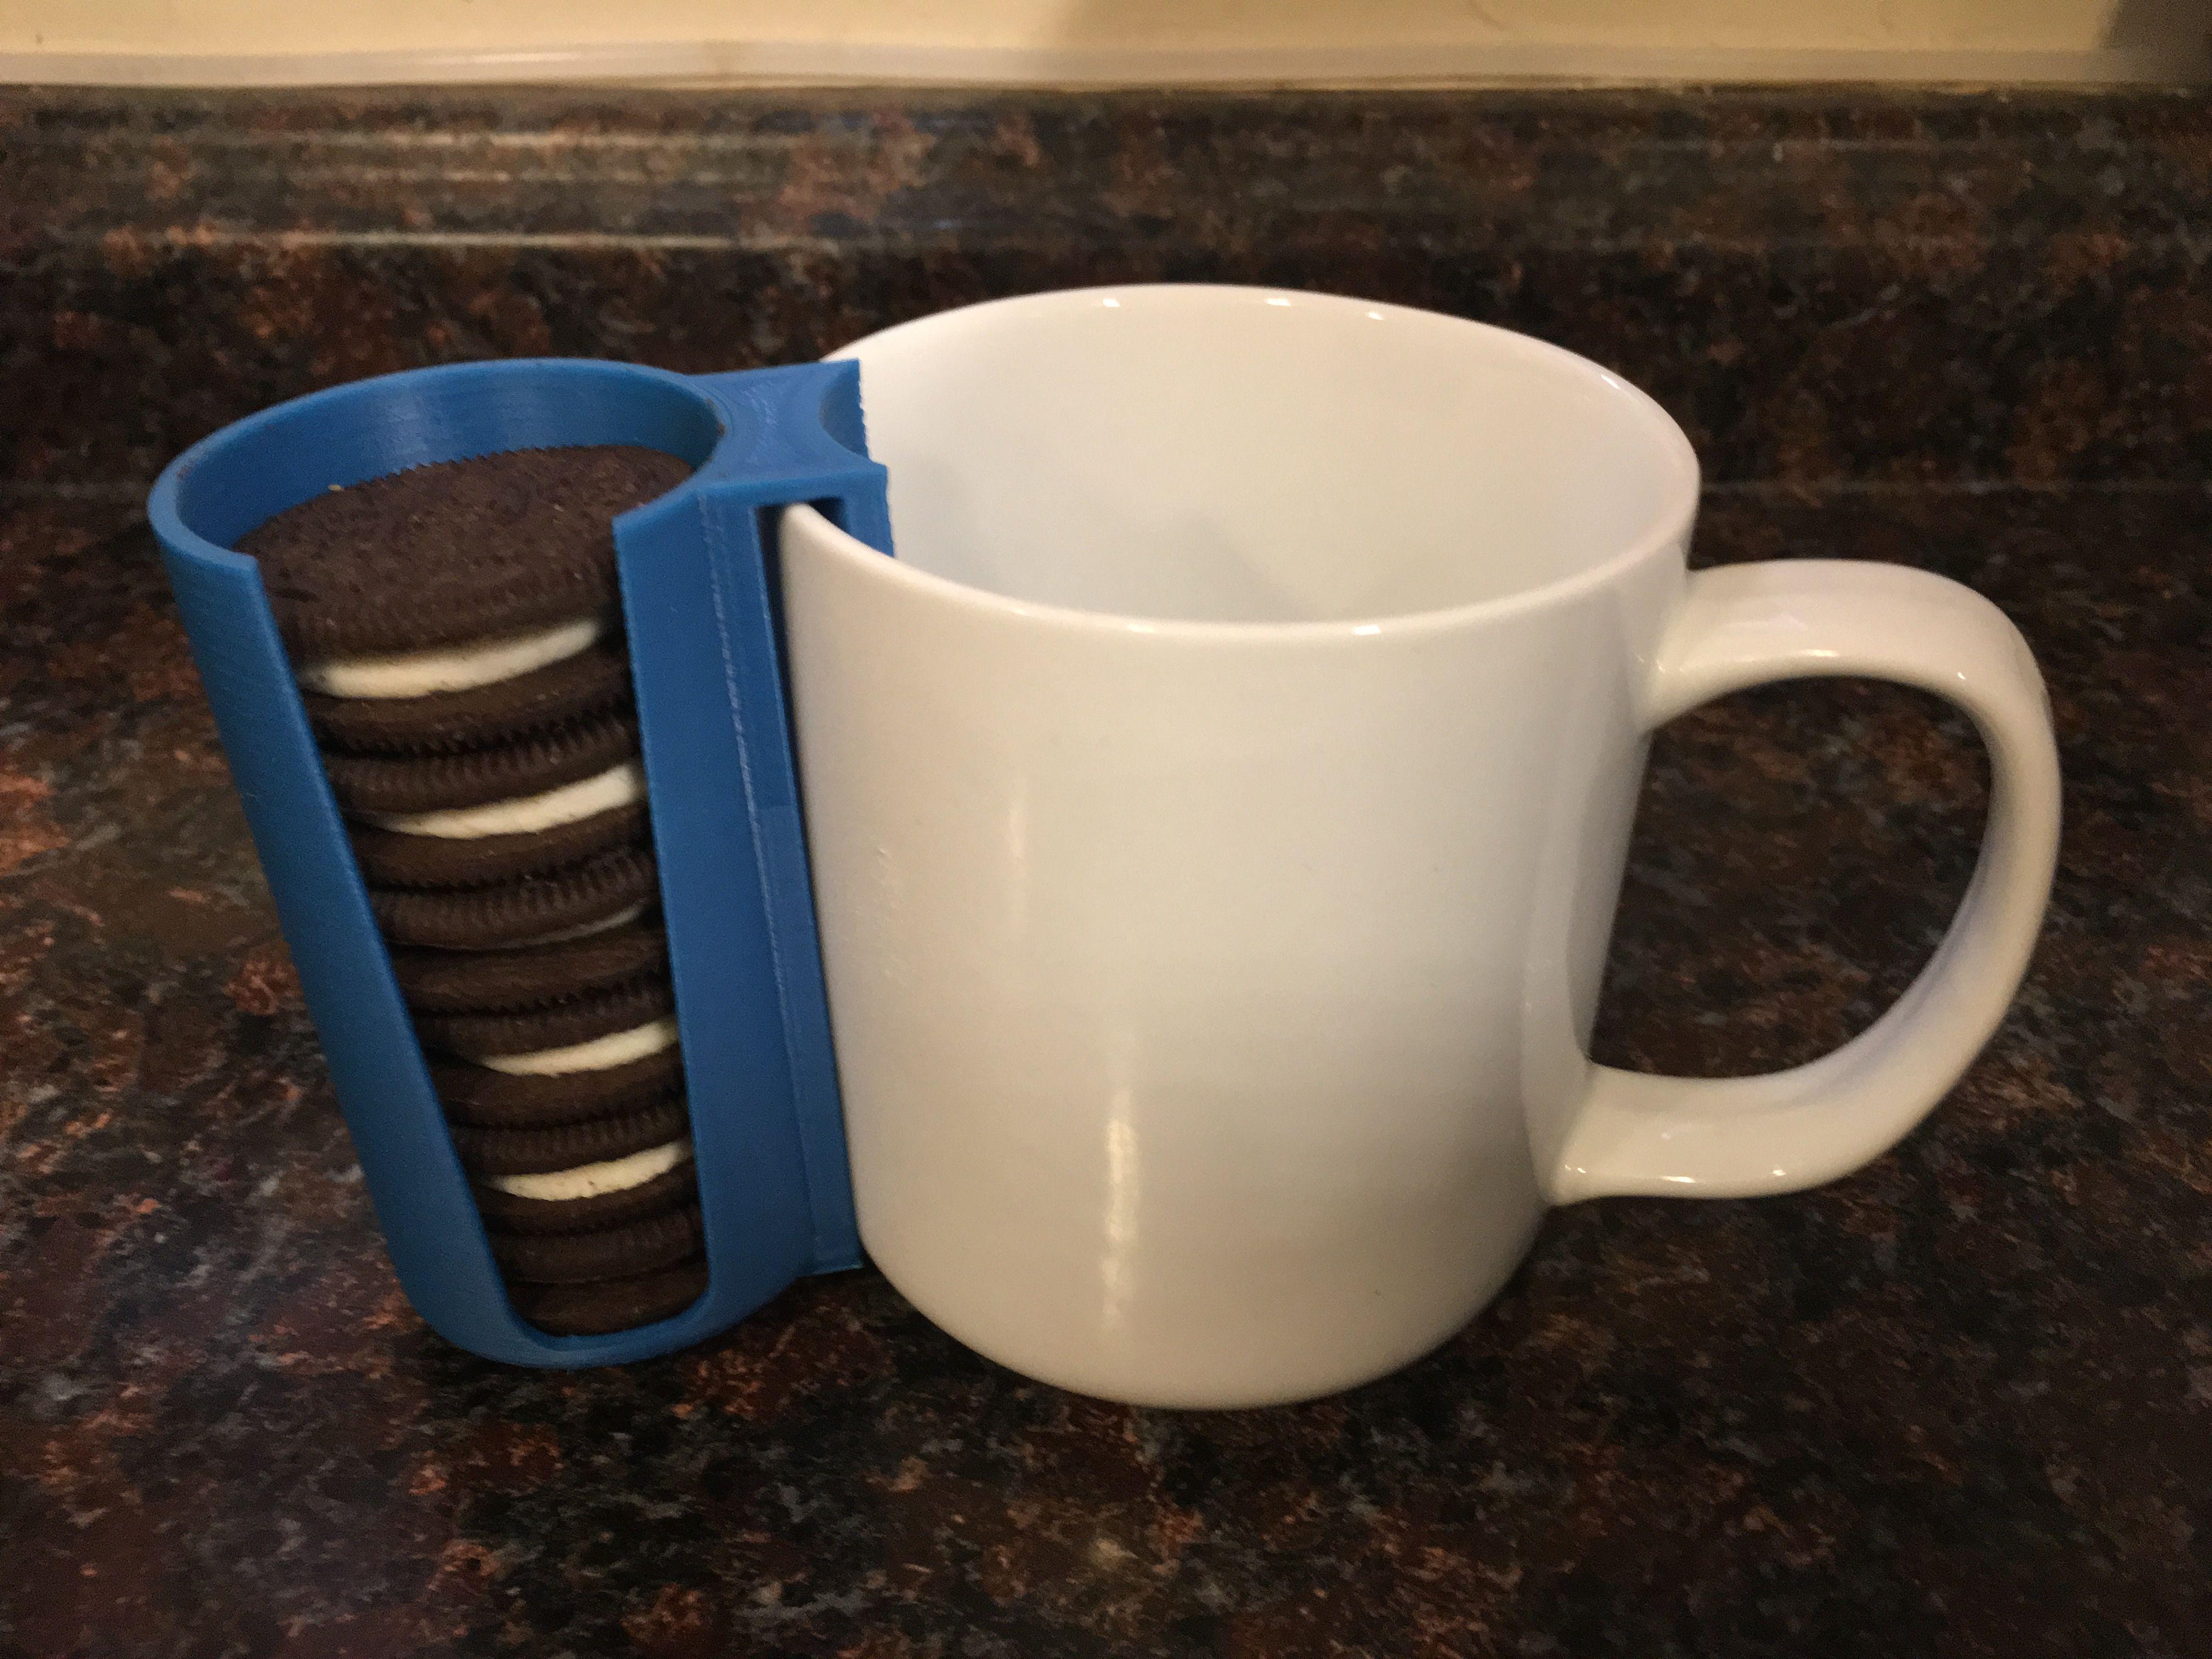 Oreo Cookie Holder 3d Printed For Oreos Or Generic Cookies Like Holds 6 Double 7 Single Comes I Tea Bag Mug Christmas Mugs